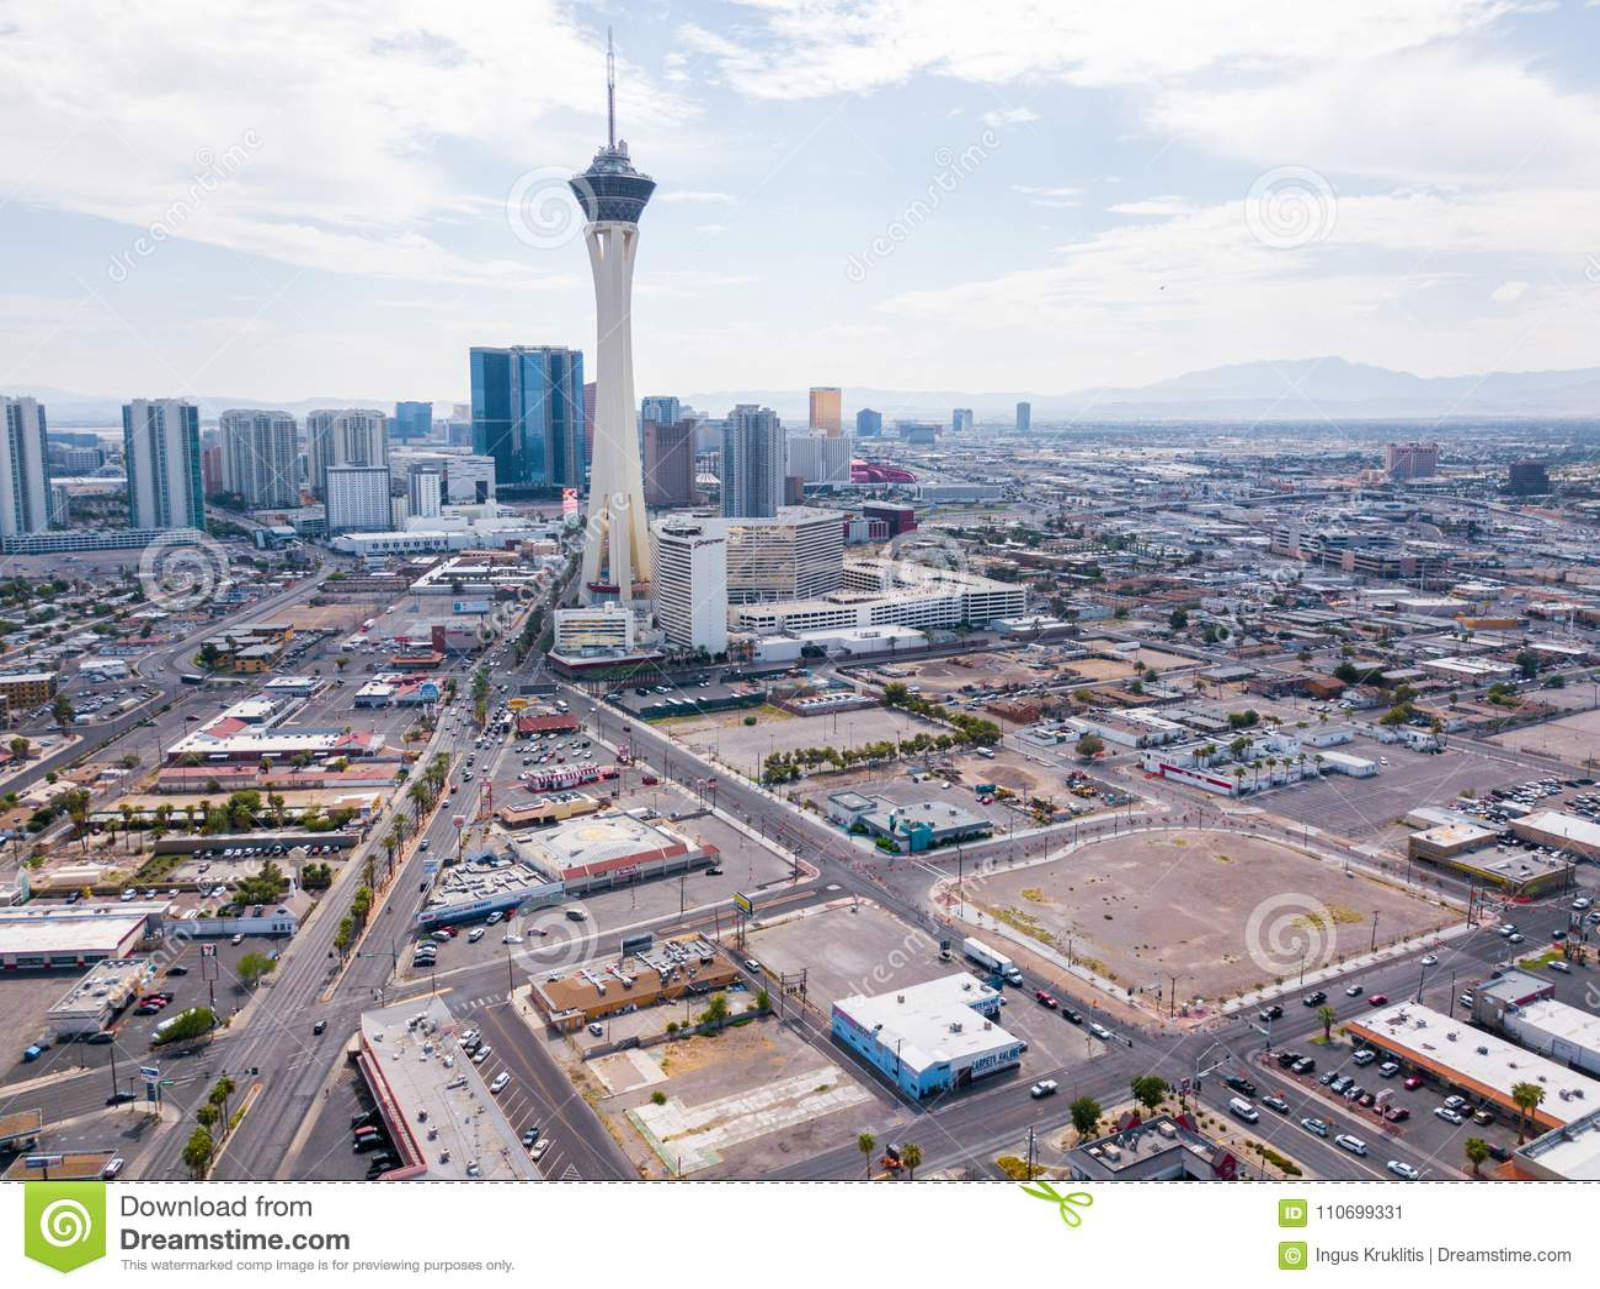 Stratosphere Hotel In Las Vegas Editorial Photo Image Of Entertainment Nevada 110699331